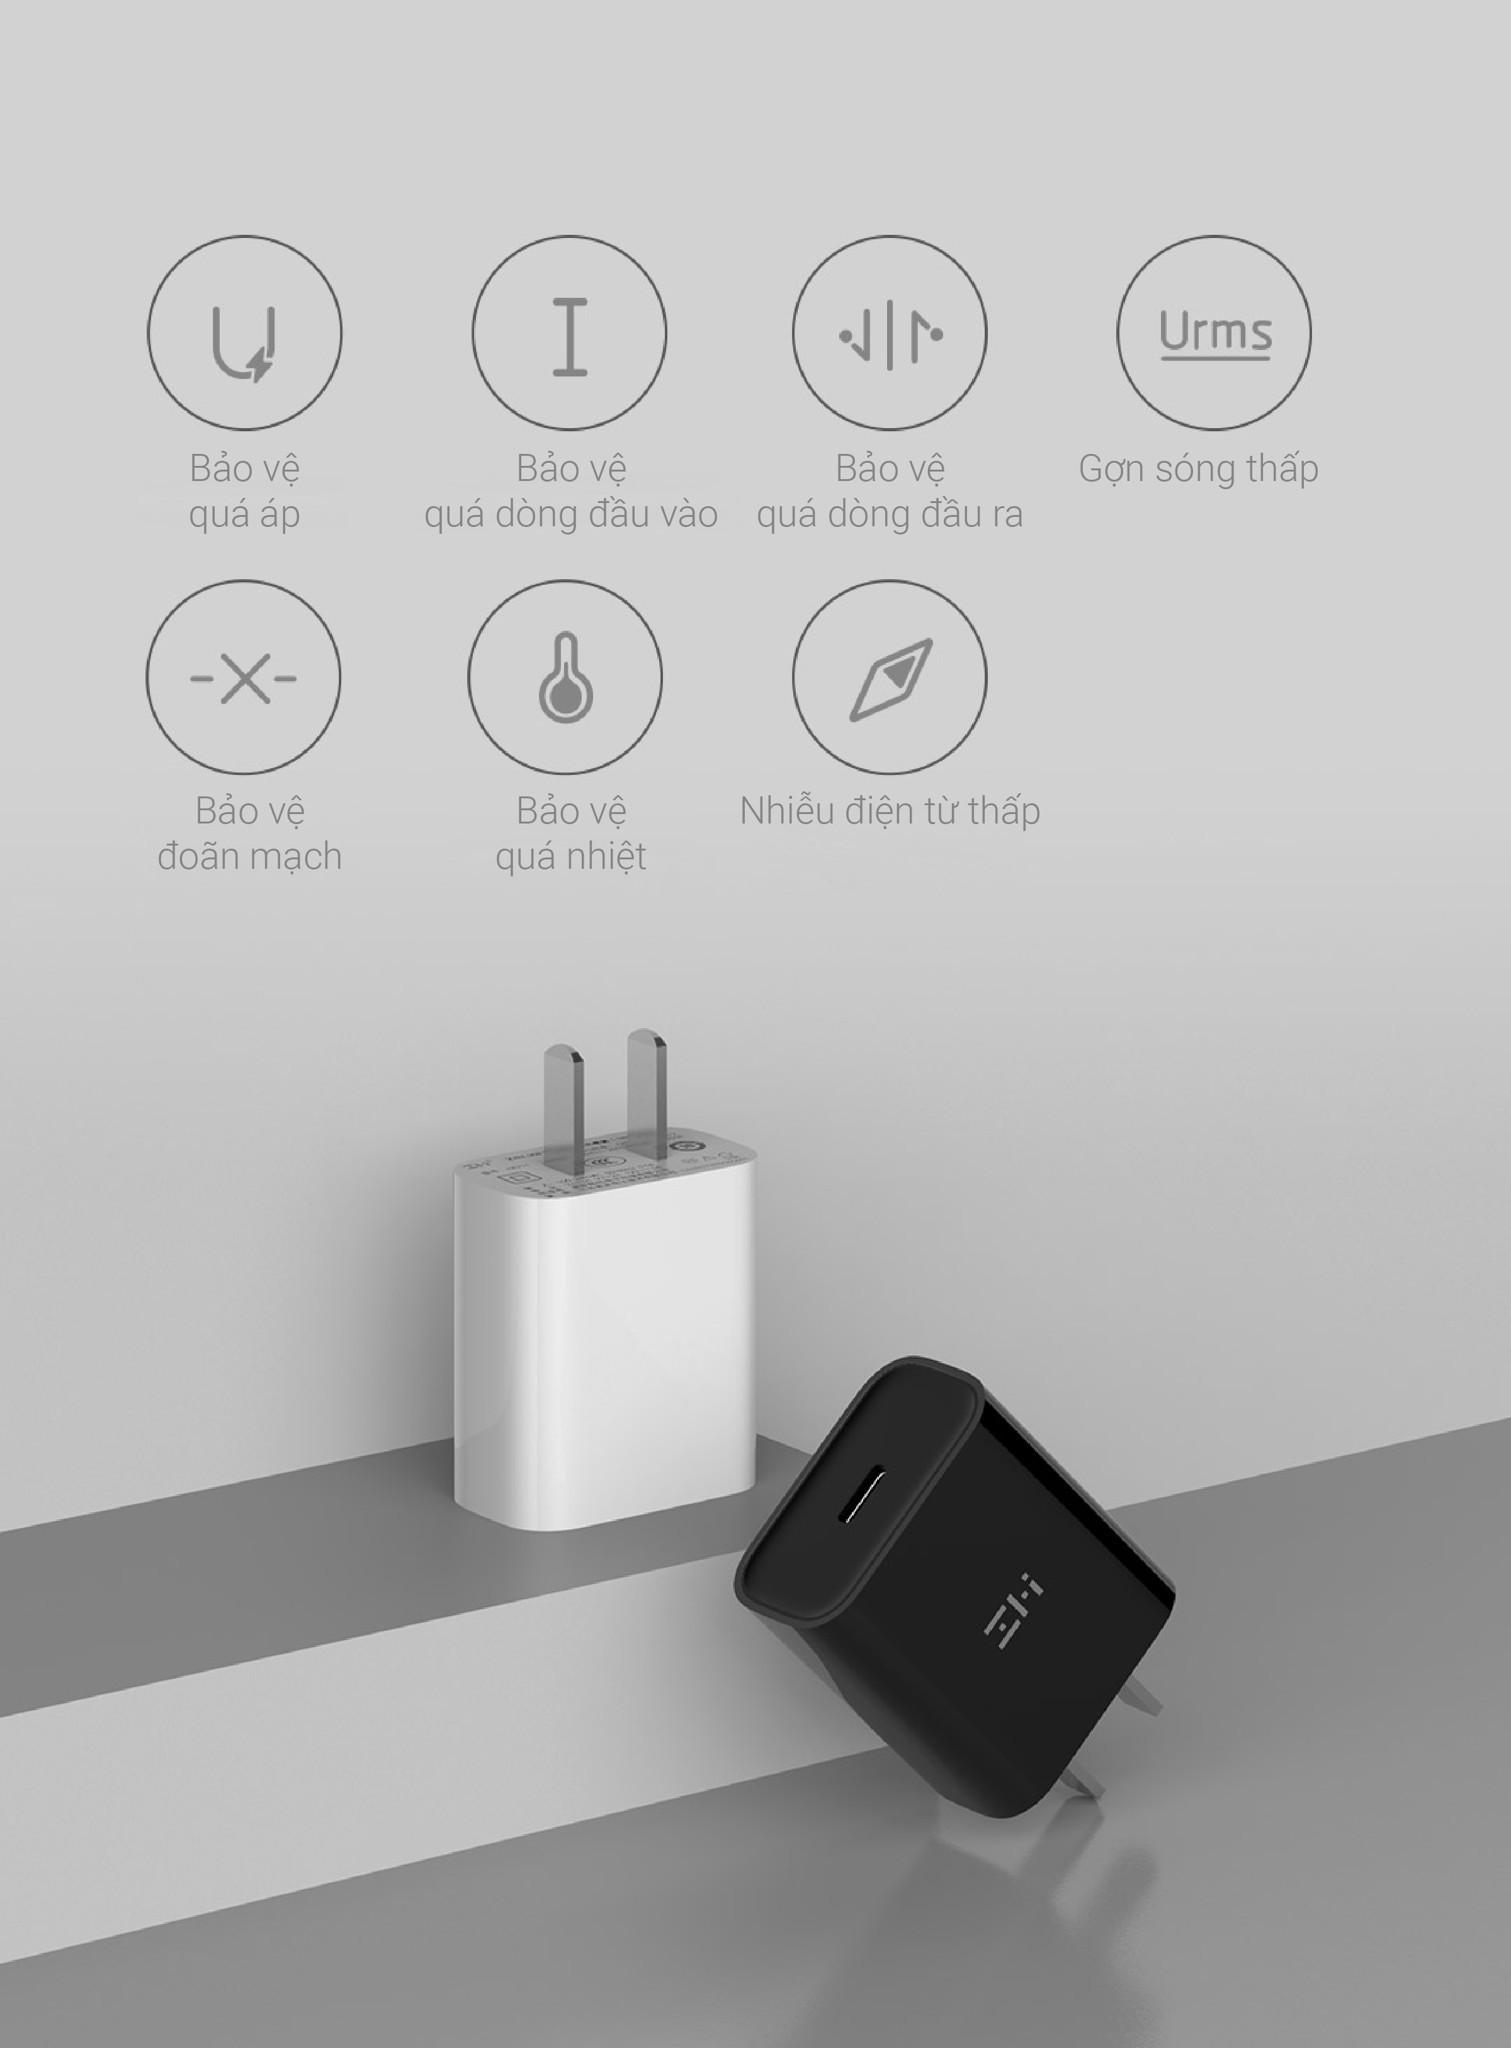 Adapter Sạc Nhanh ZMI HA711 USB Type-C 18W (White)